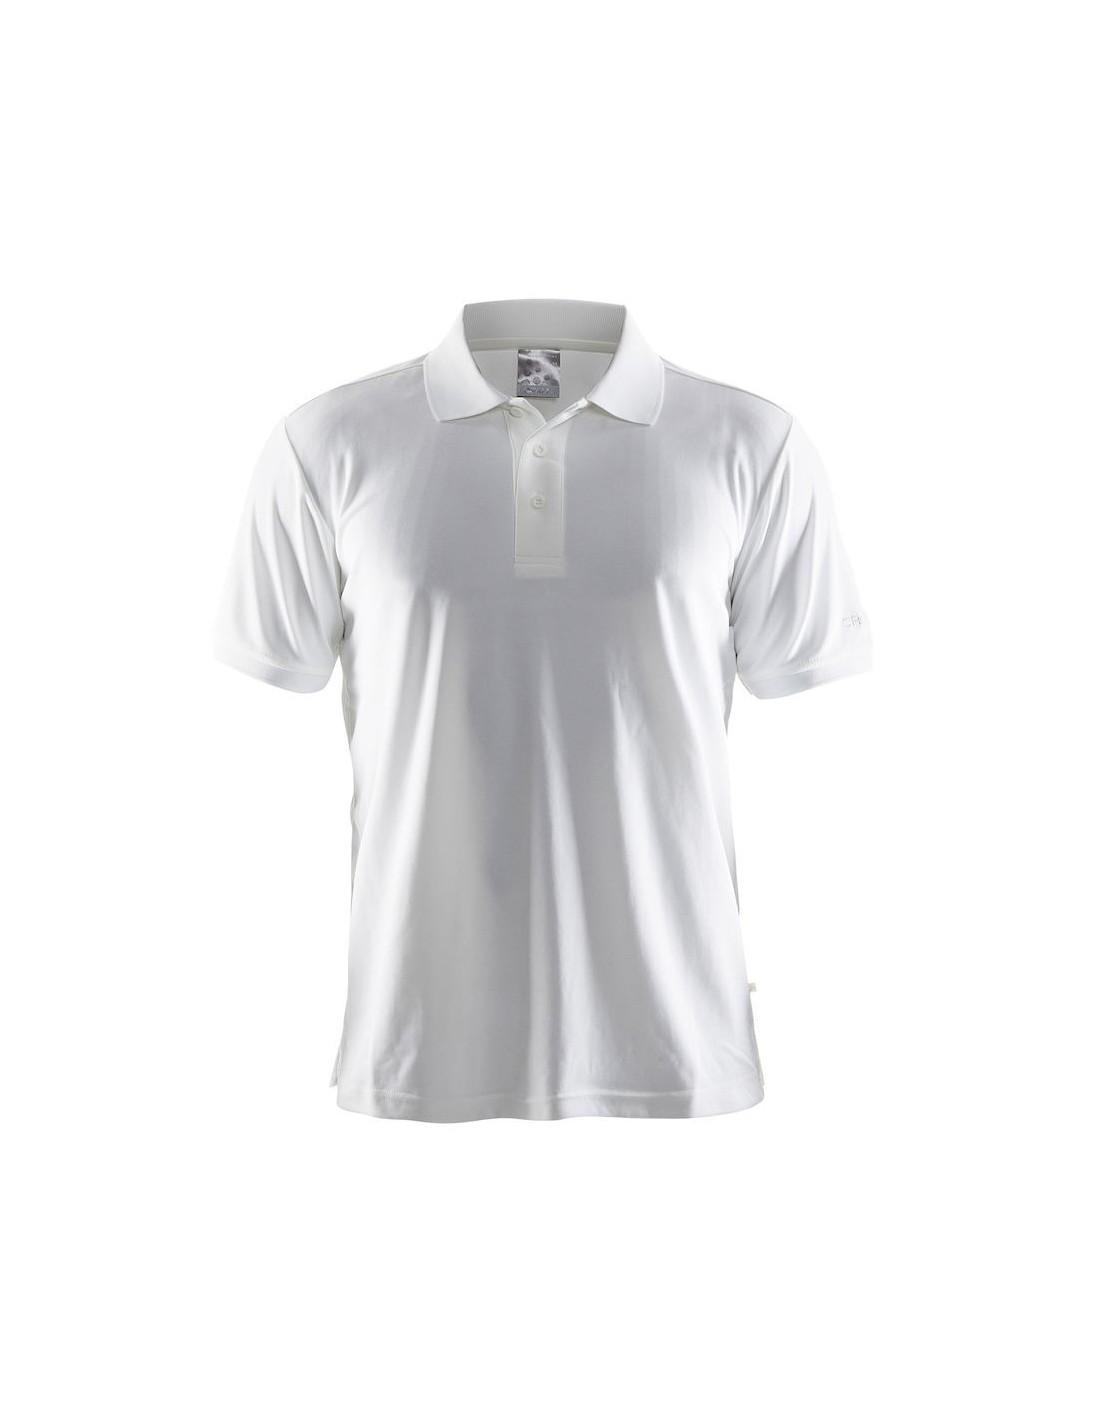 e330712796ed6c Koszulka męska Craft Polo Shirt Pique Classic biała - STSklep